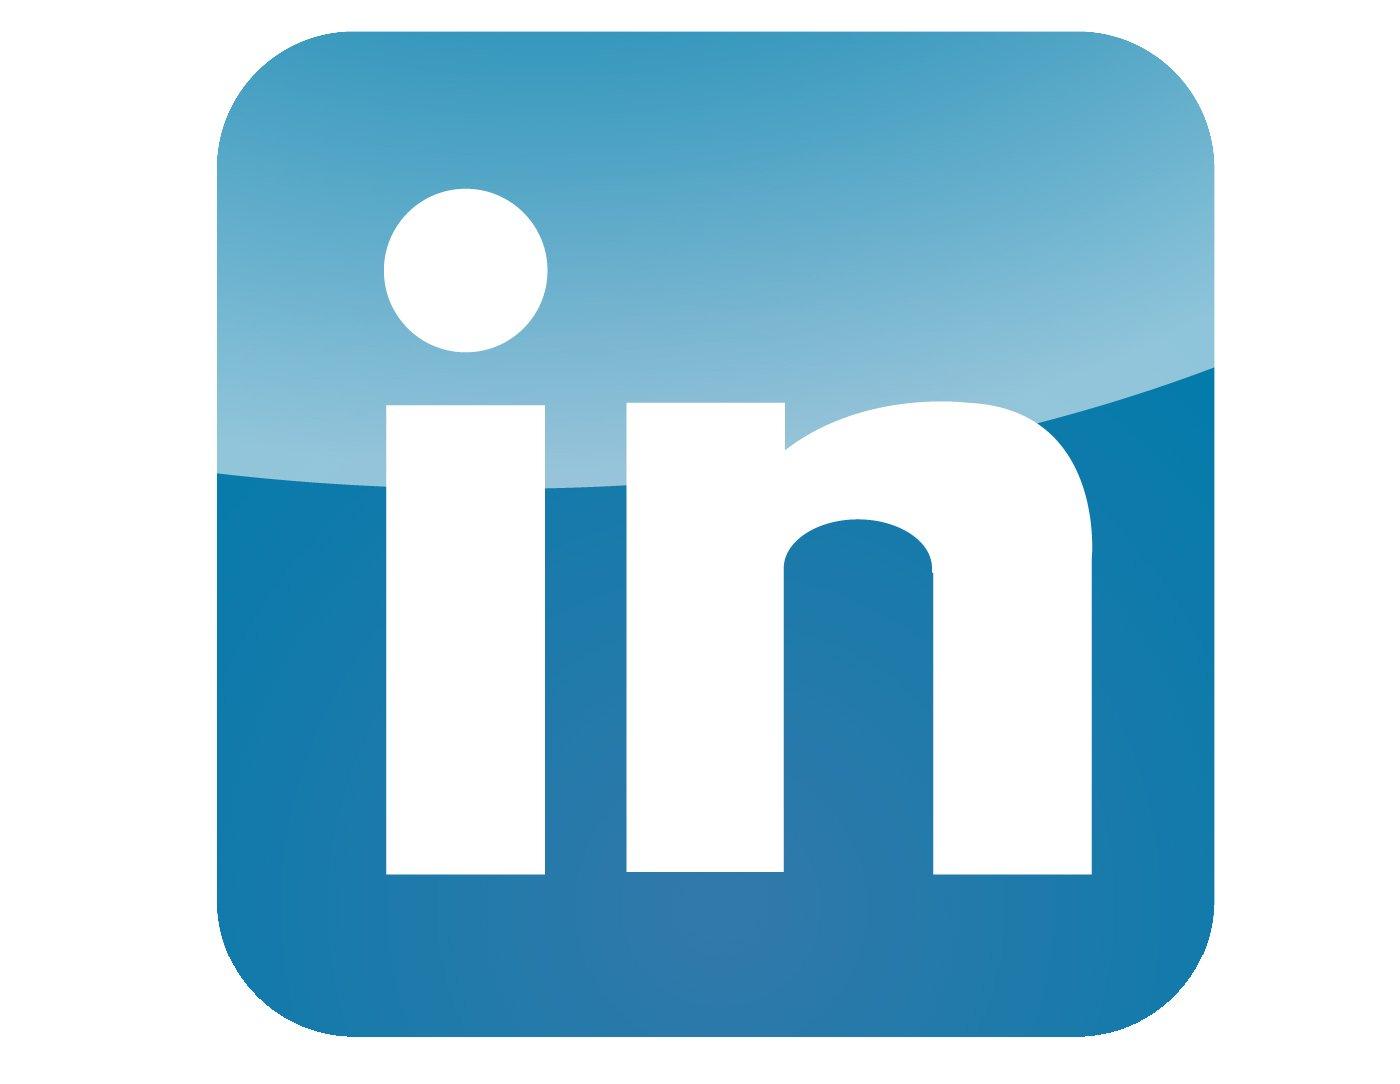 LinkedIn logo : histoire, signification et évolution, symbole